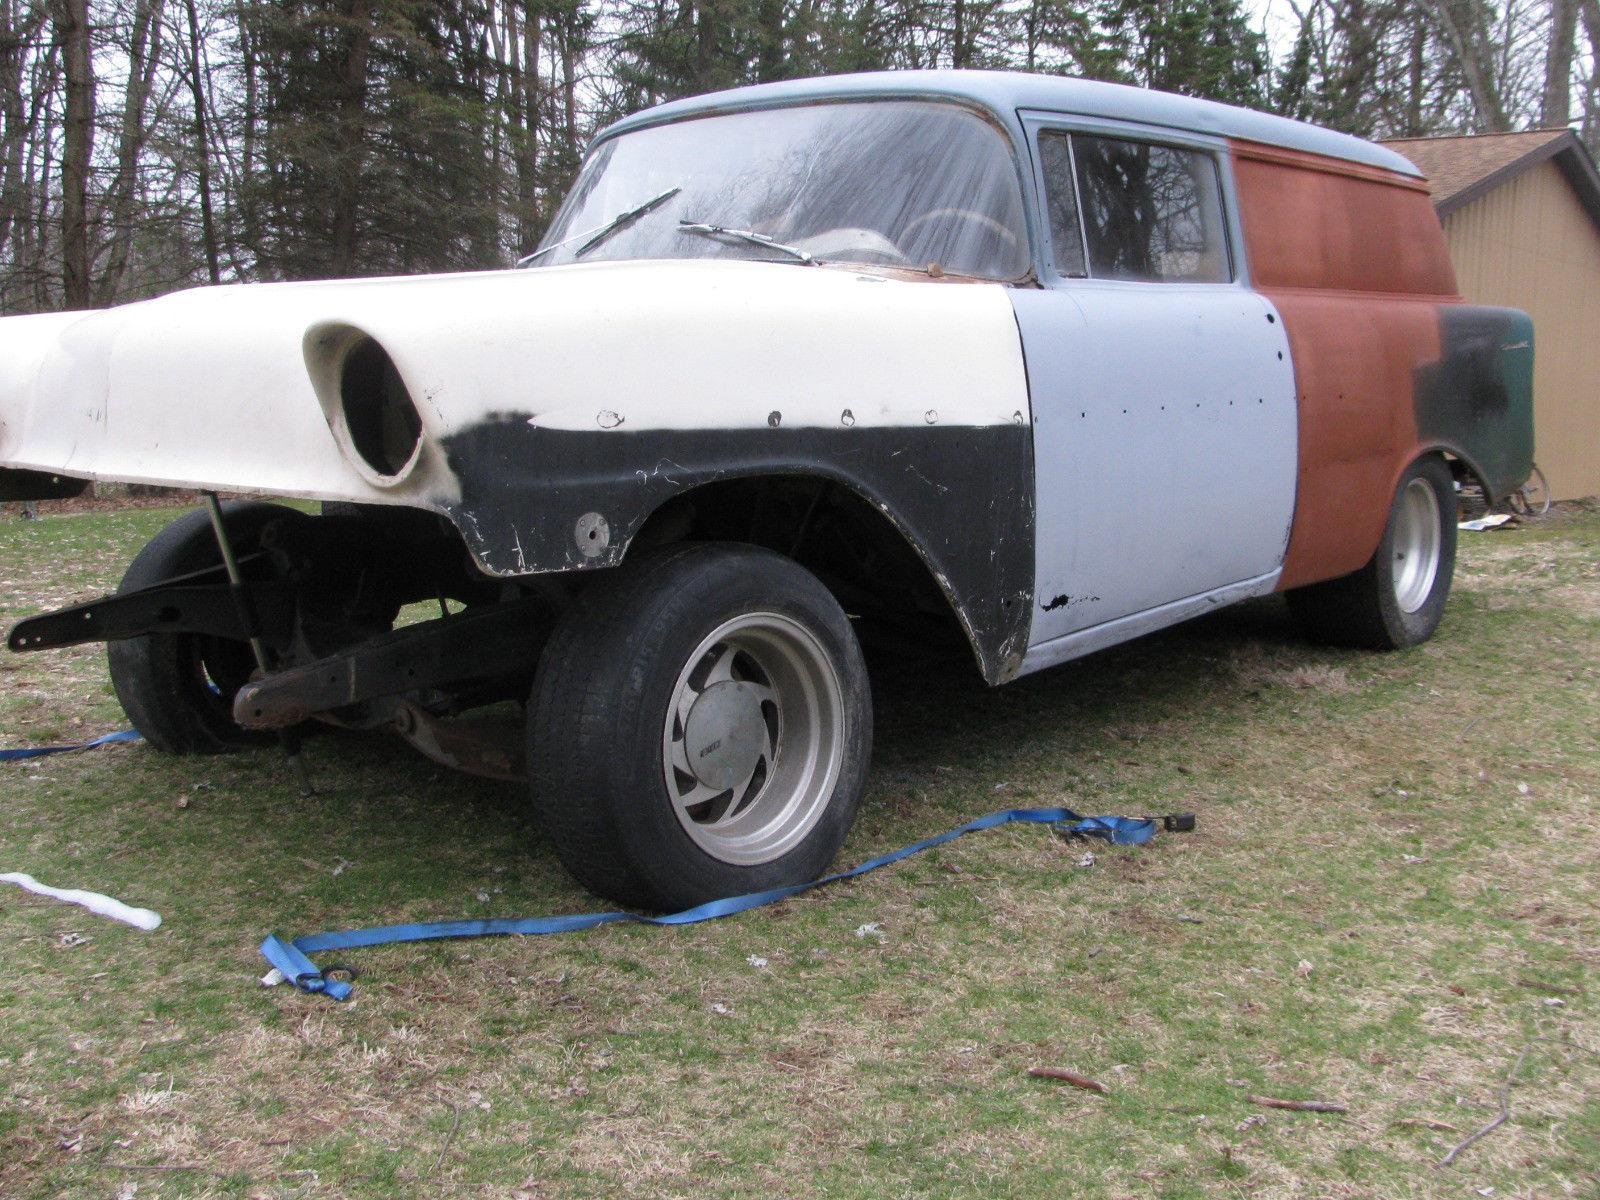 Amazing 1956 Chevrolet Bel Air/150/210 56 Chevy Sedan Delivery Project –  Gasser – Drag Race -Rat Rod – NHRA Nostalgia 2018-2019